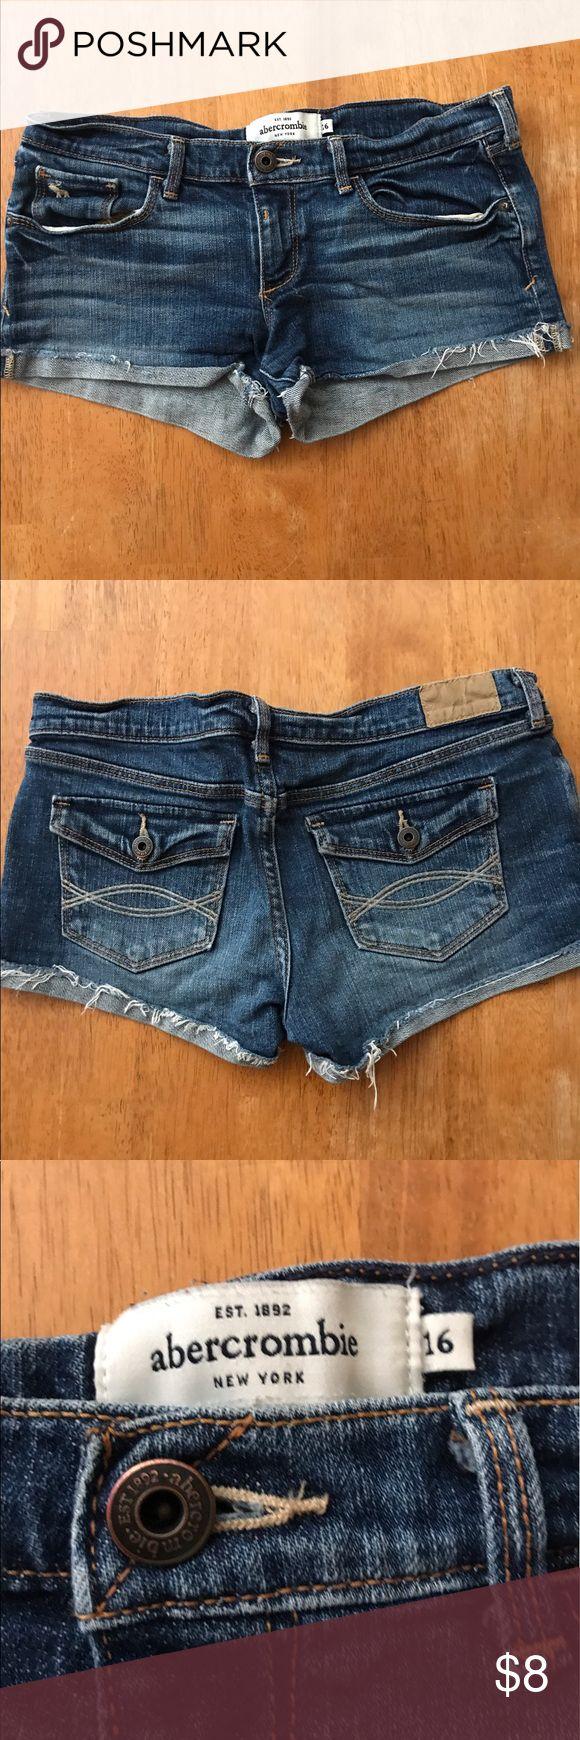 Abercrombie Jeans Shorts size 16 Good condition Abercombie Kids Shorts Jean Shorts